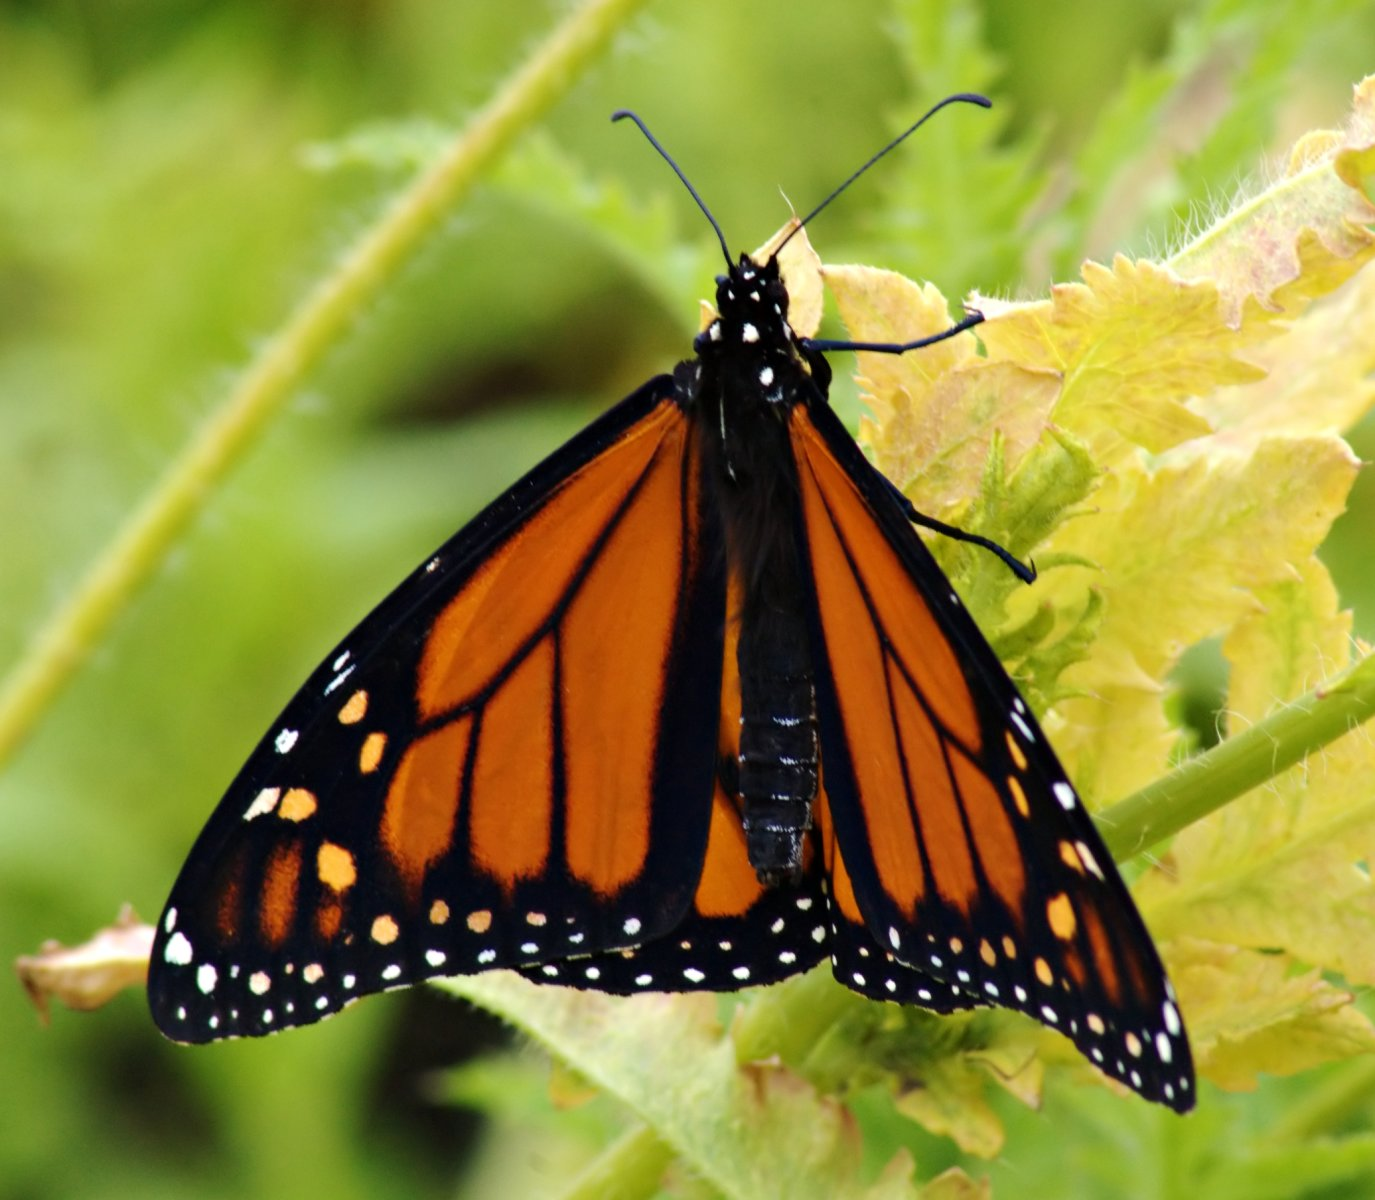 Monarch butterfly body - photo#27